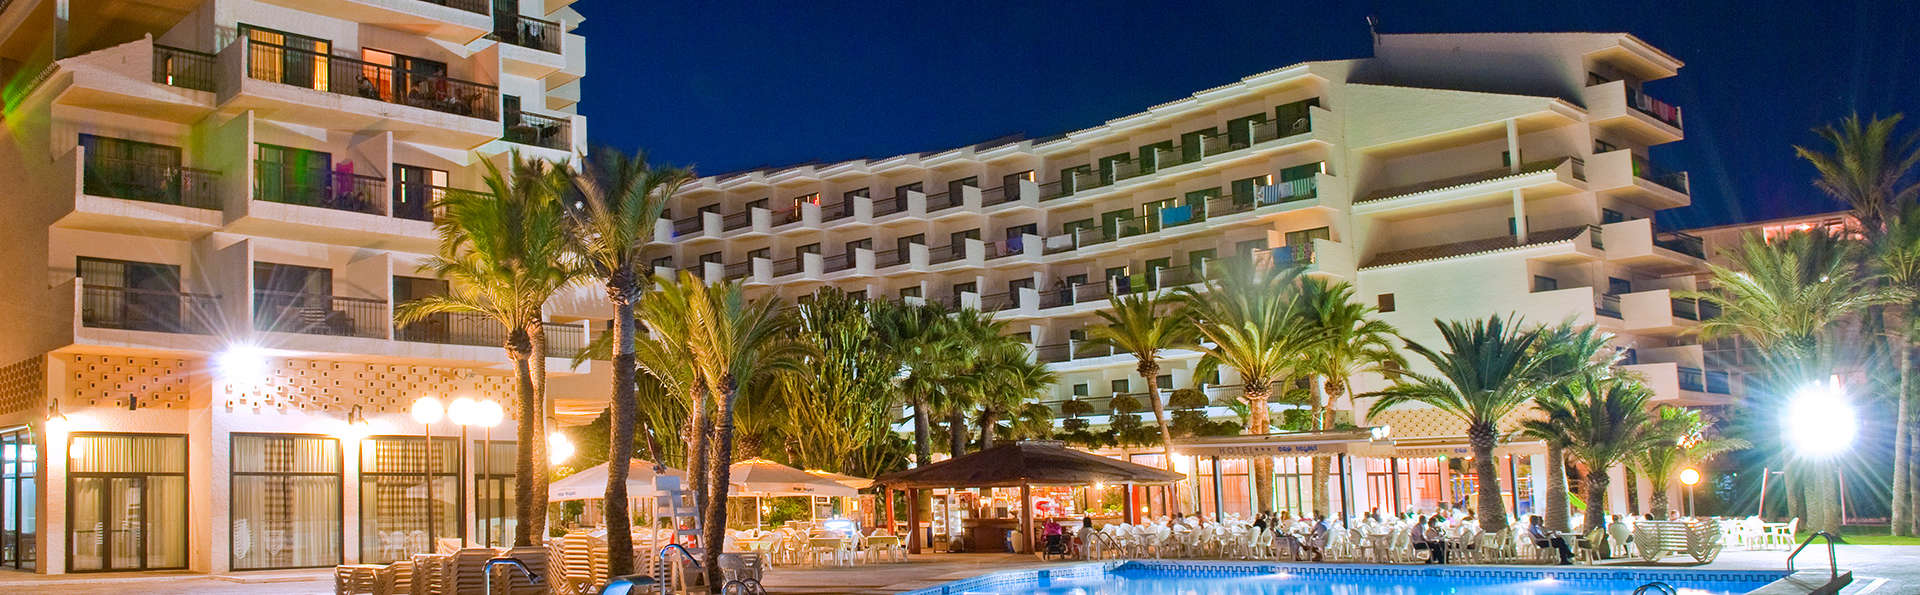 Hotel Cap Negret - edit_noche_vista_frontal.jpg